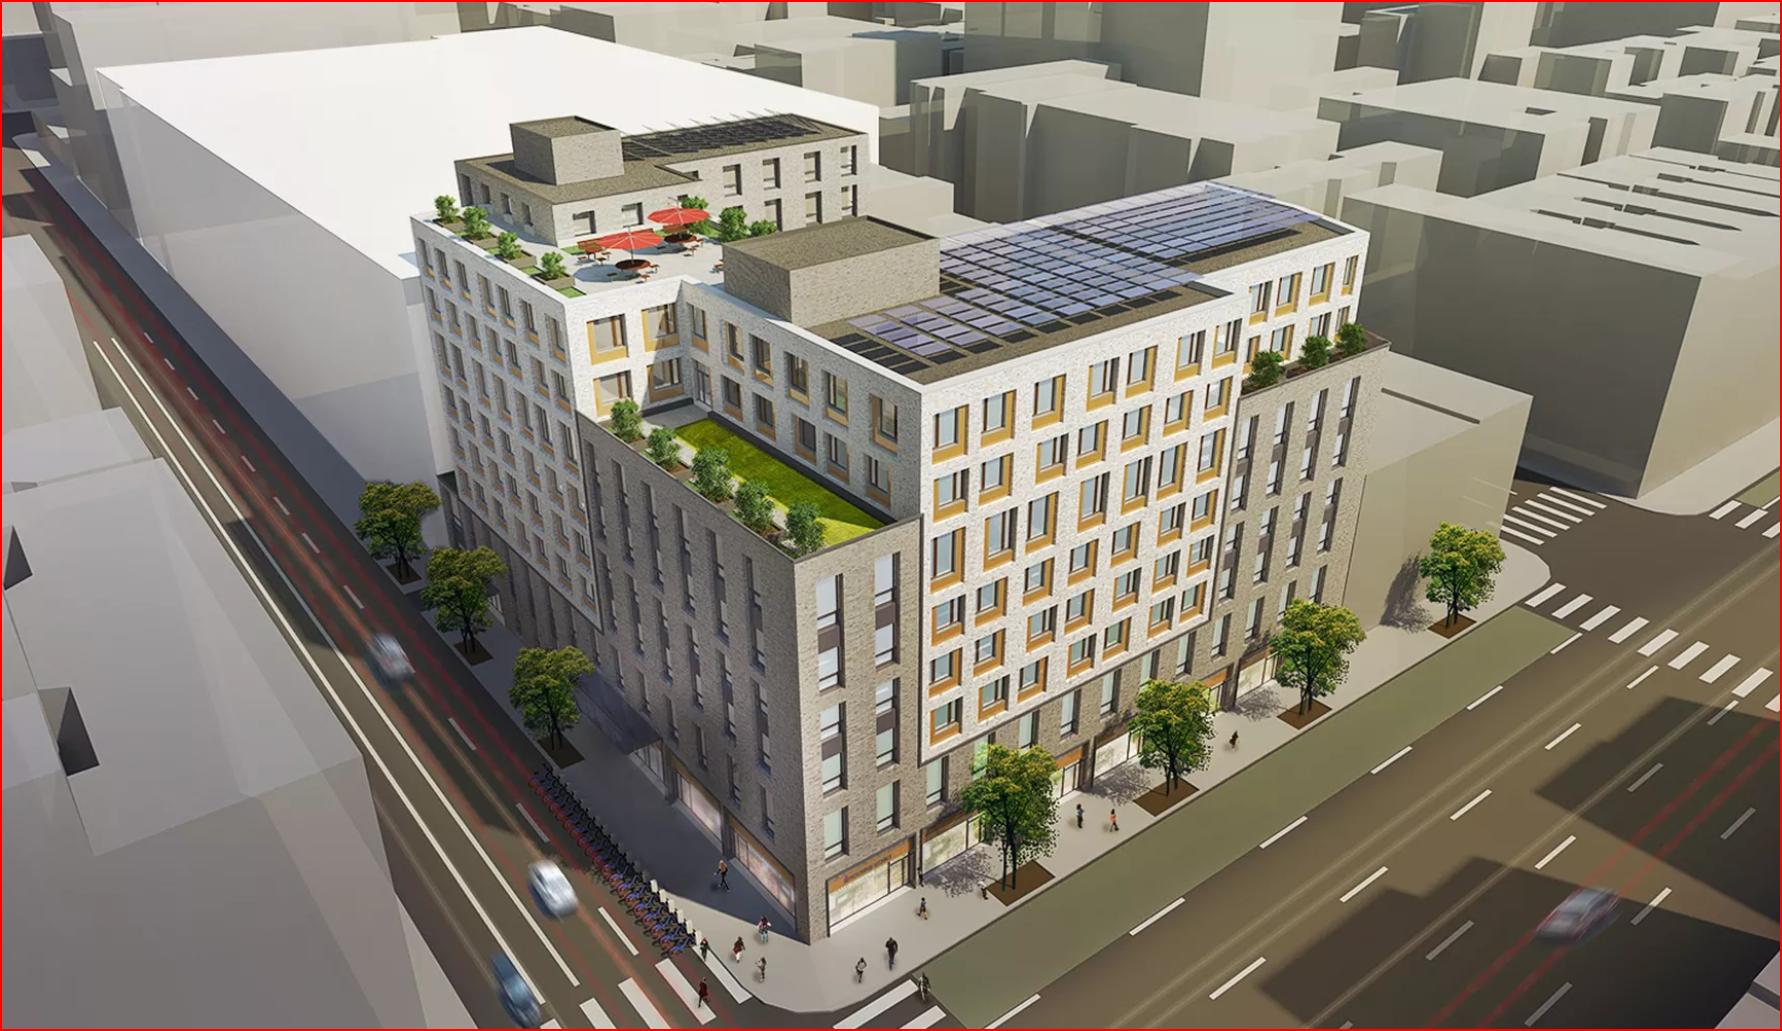 Sendero Verde A 100 Percent Affordable Apartment Development In East Harlem In New York Building Exterior Affordable Apartments Building Design